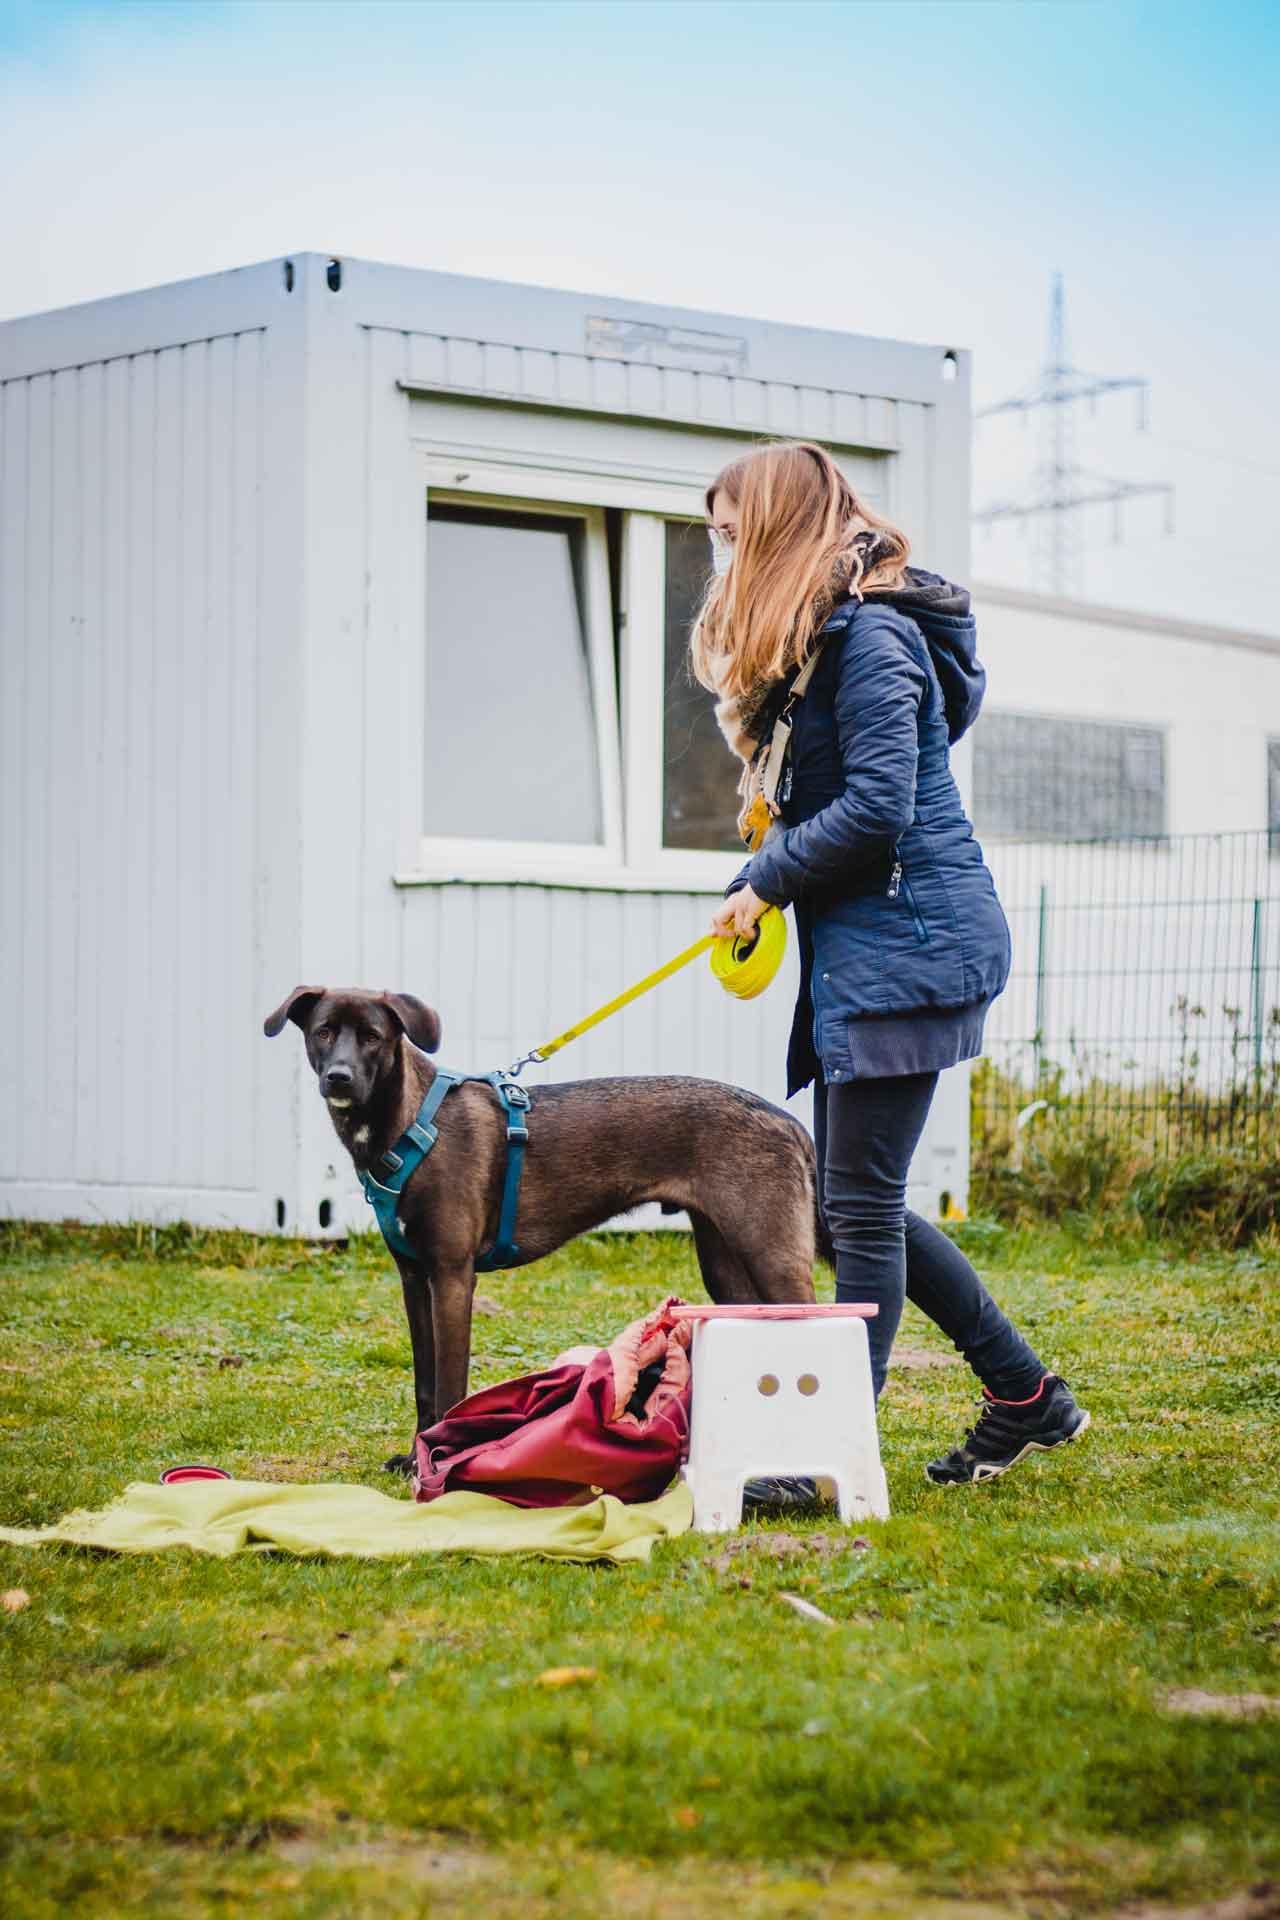 hundpunkt_hundeschule_muenster-ibbenbueren-einzelcoaching